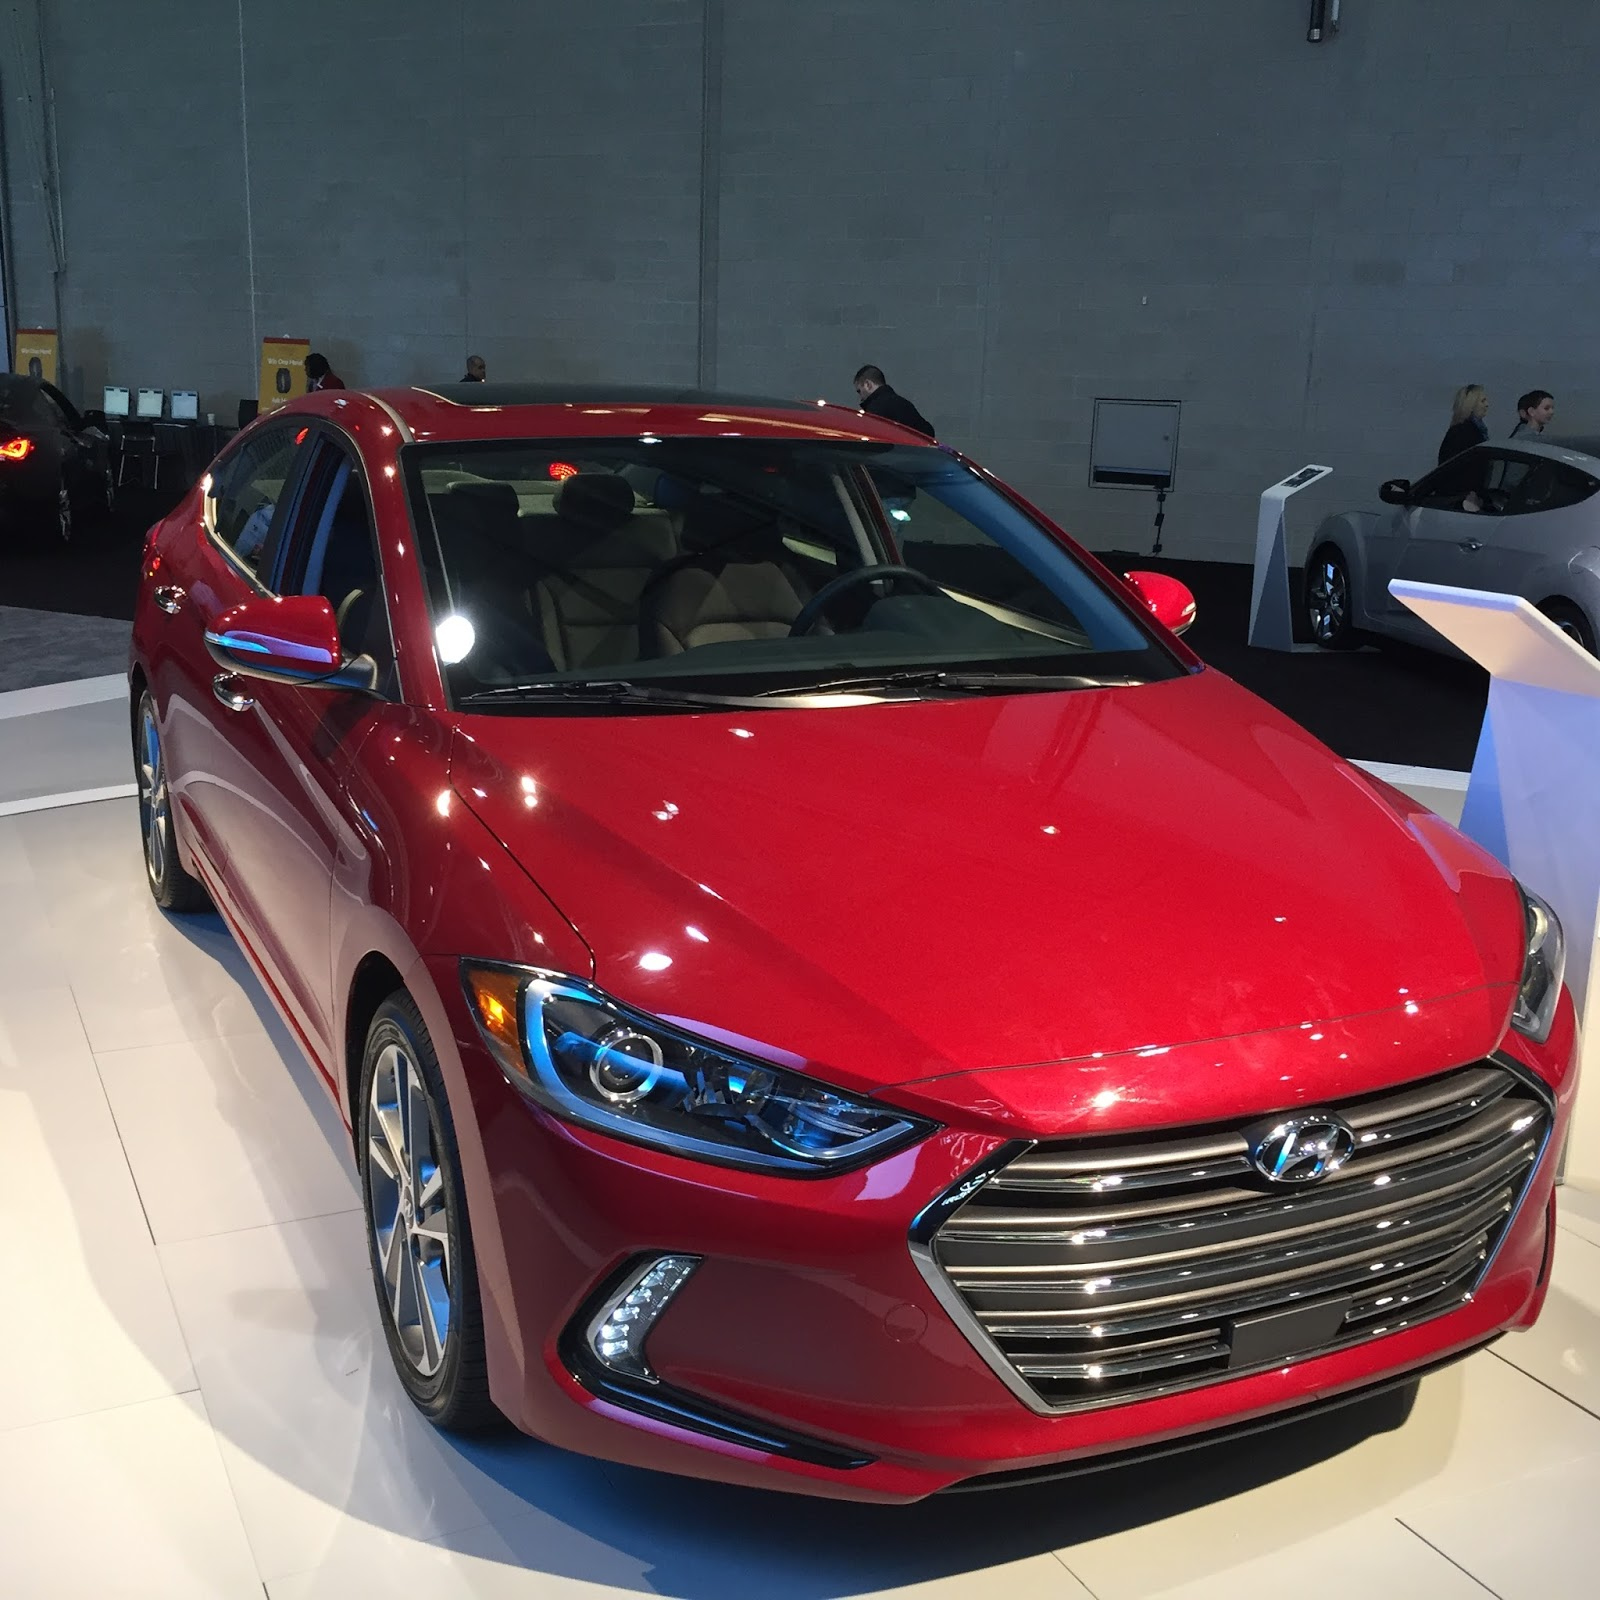 2016 new england international auto show review | car news commentary